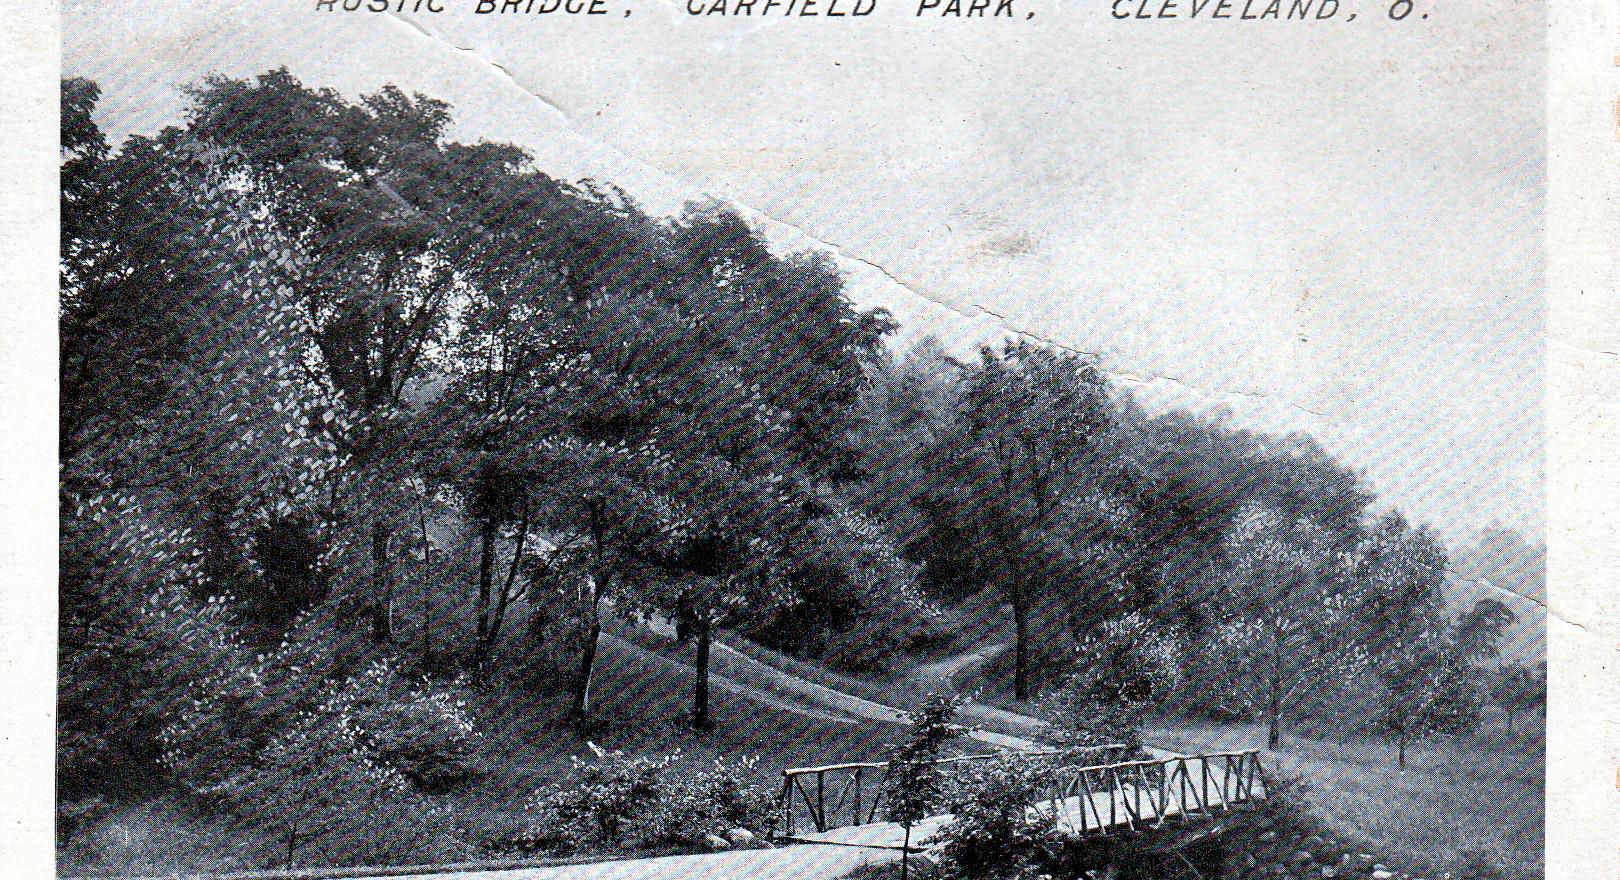 Bridge in Garfield Park 1912 - Copy.jpg